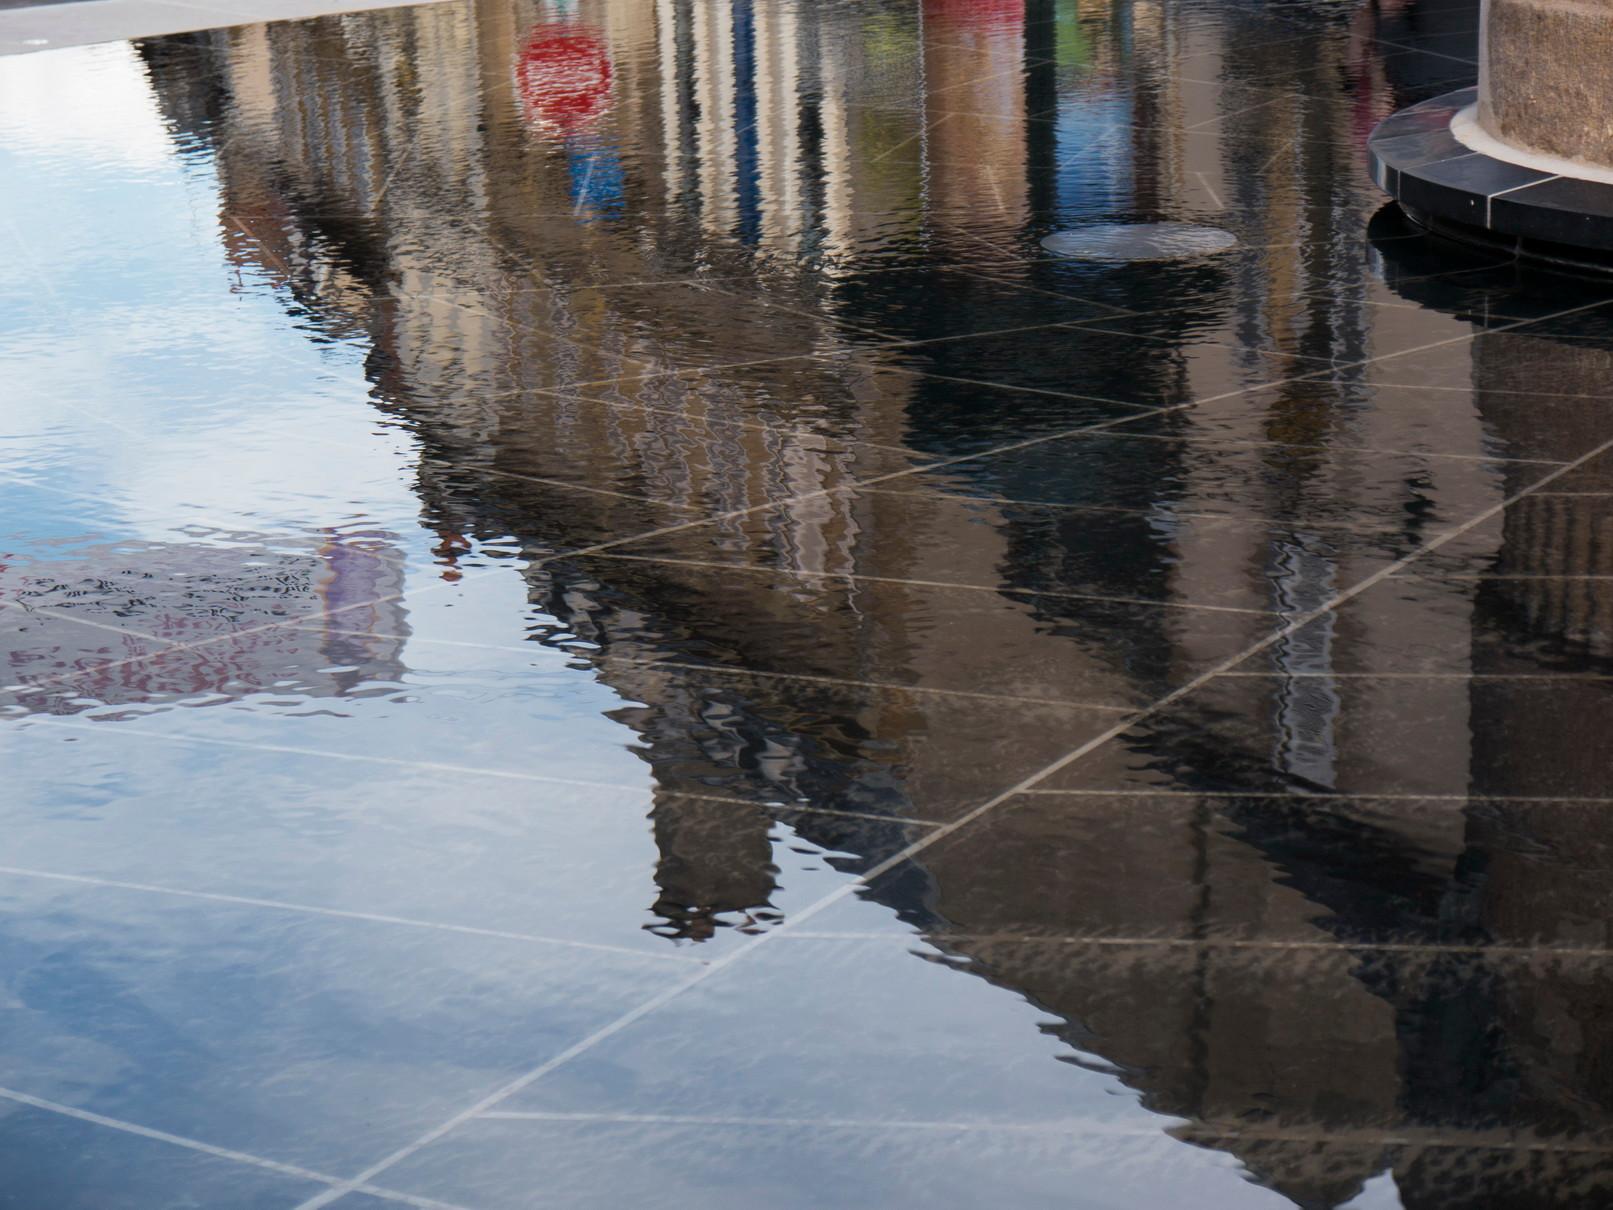 Fotografie, Urban, Stadt, Straßen, Nikon